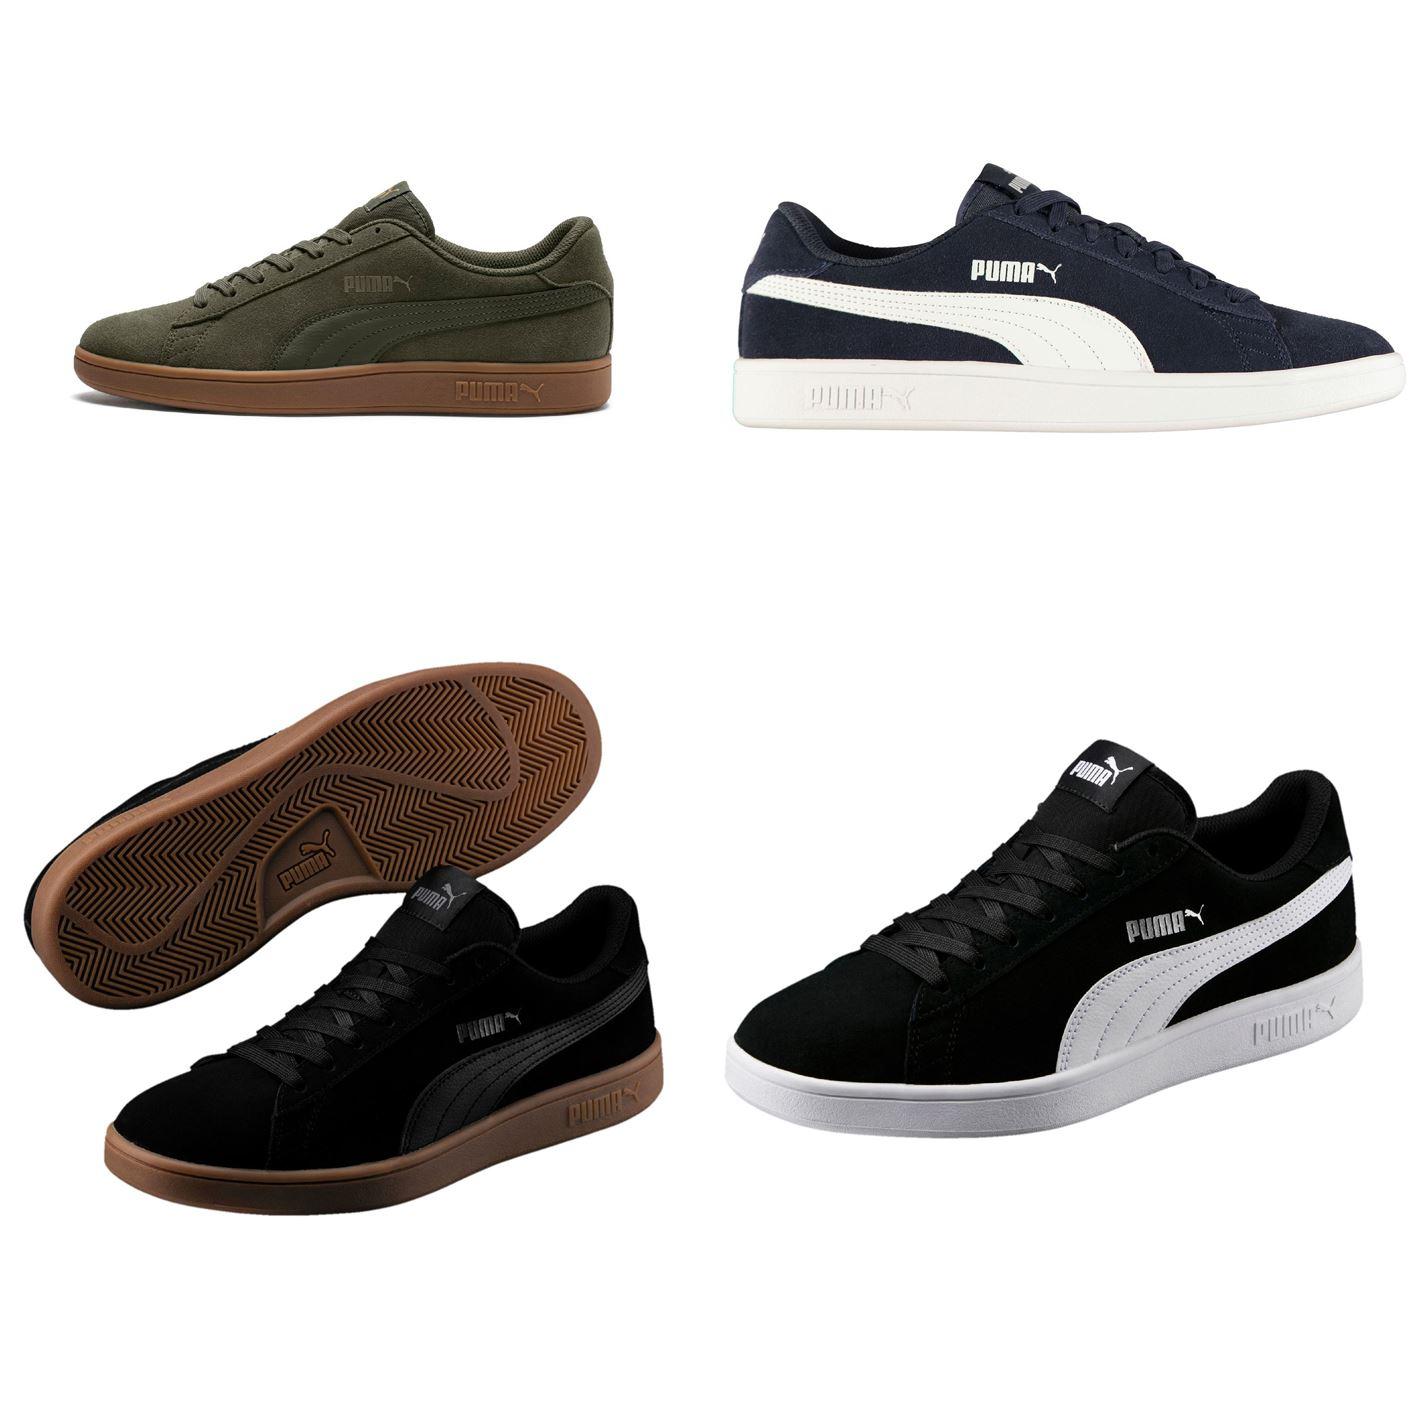 ... Puma Smash V2 Suede Trainers Mens Shoes Sneakers Athleisure Footwear ... 4c9e953e7